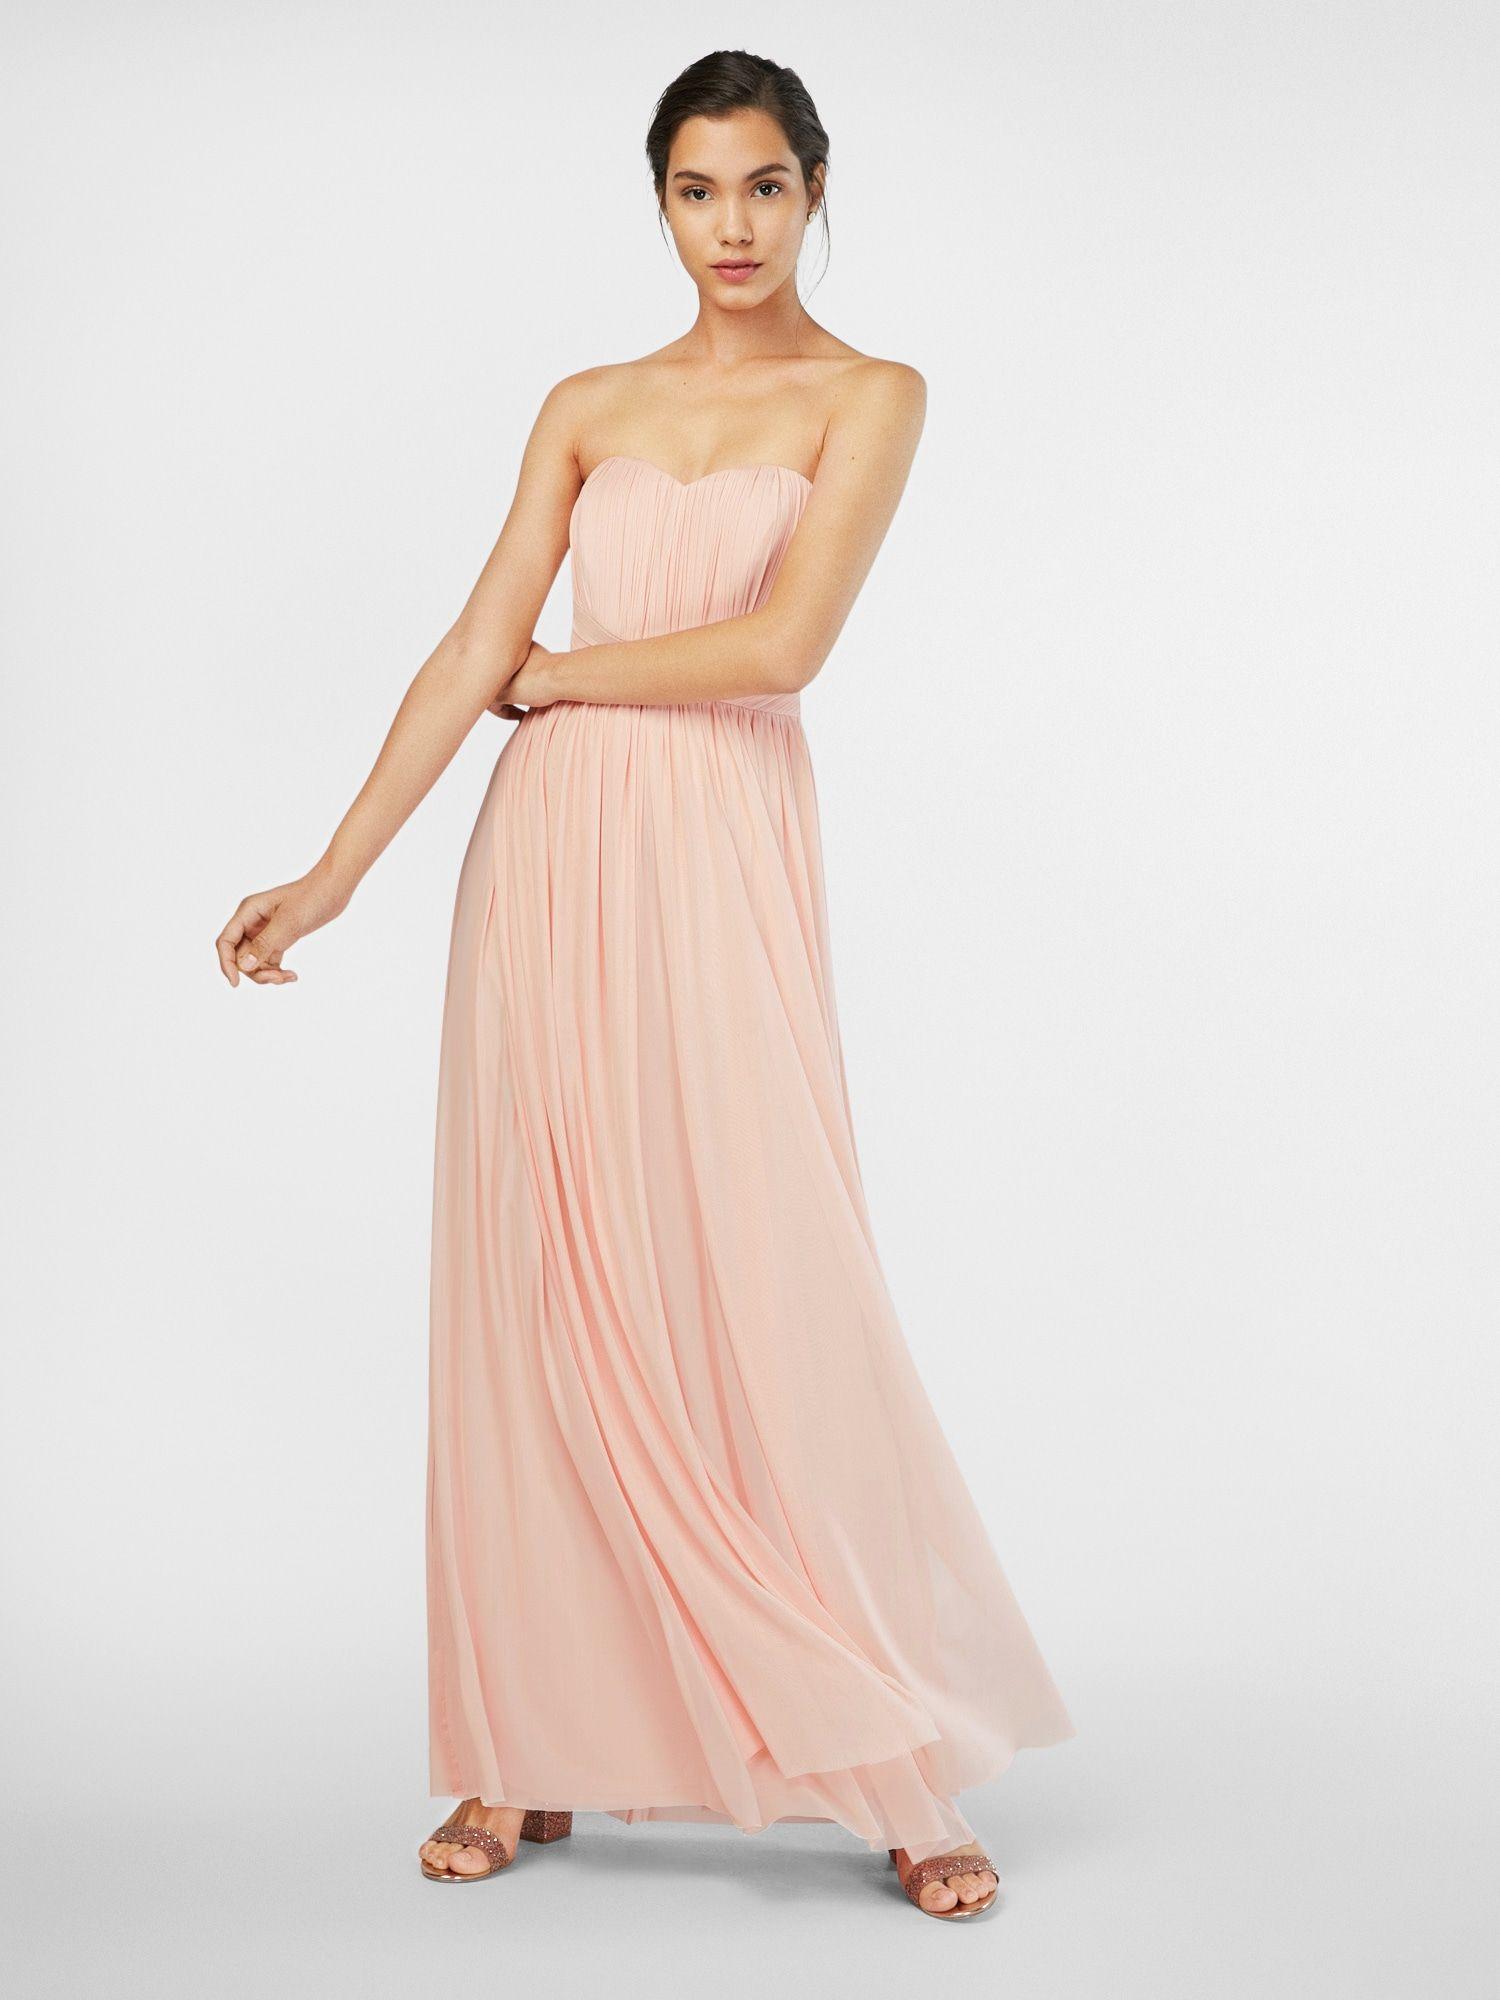 Lipsy Abendkleid Mint Bella Damen Altrosa Grosse 42 Abendkleid Mint Abendkleid Und Brautjungfern Kleider